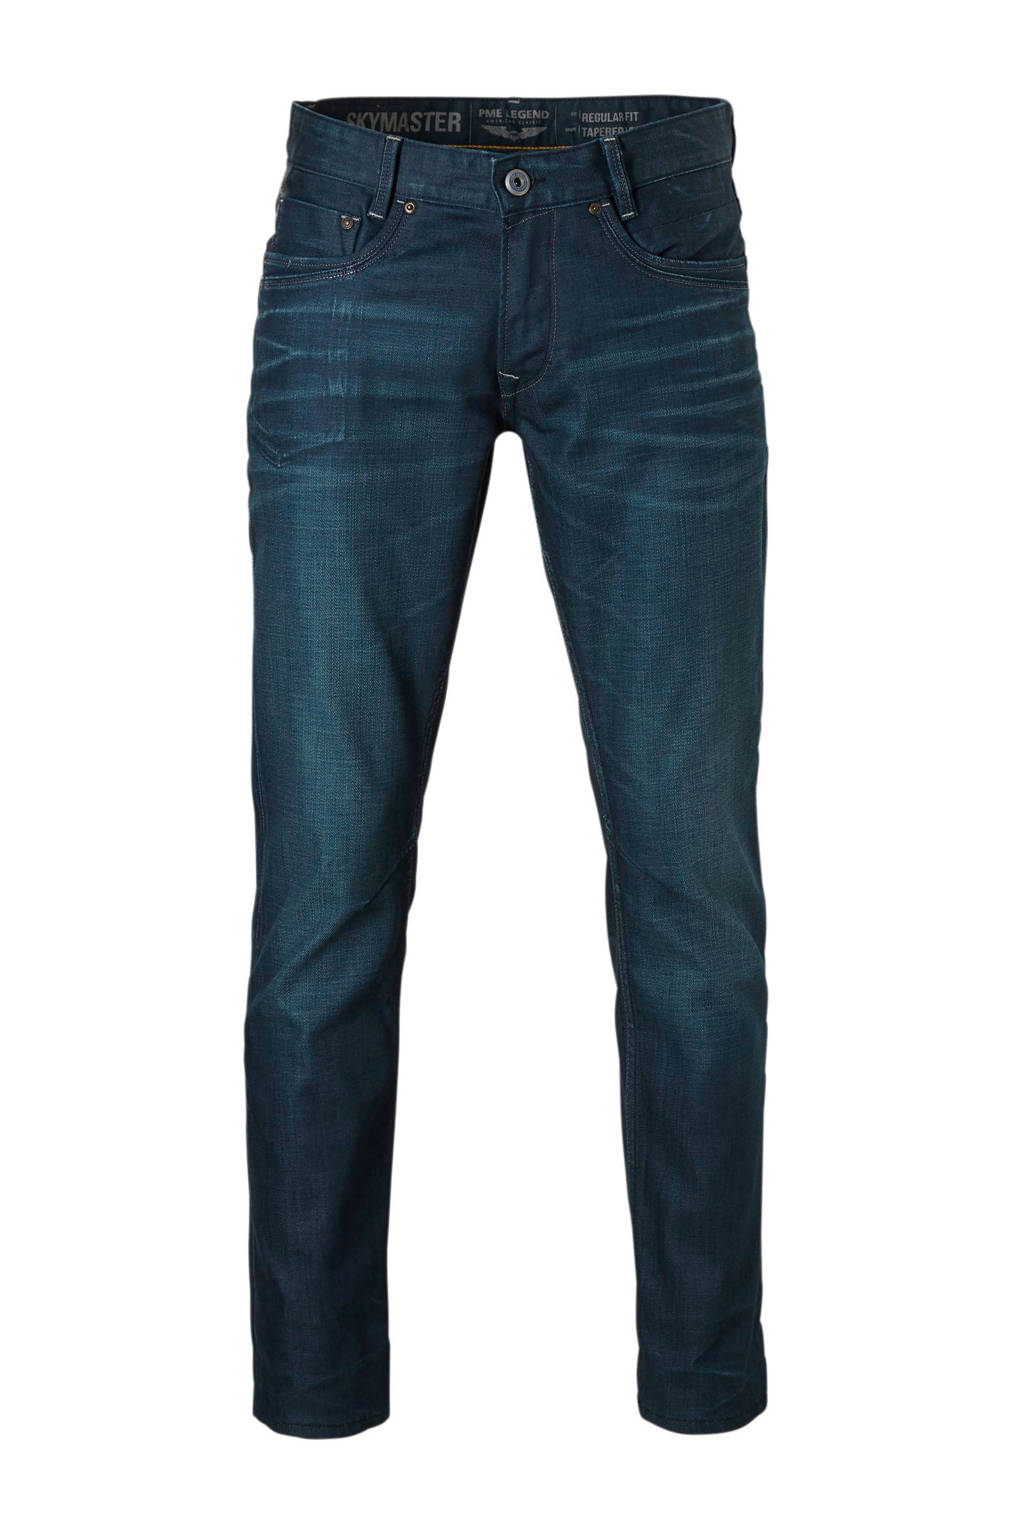 PME Legend tapered fit jeans Skymaster, Dark denim